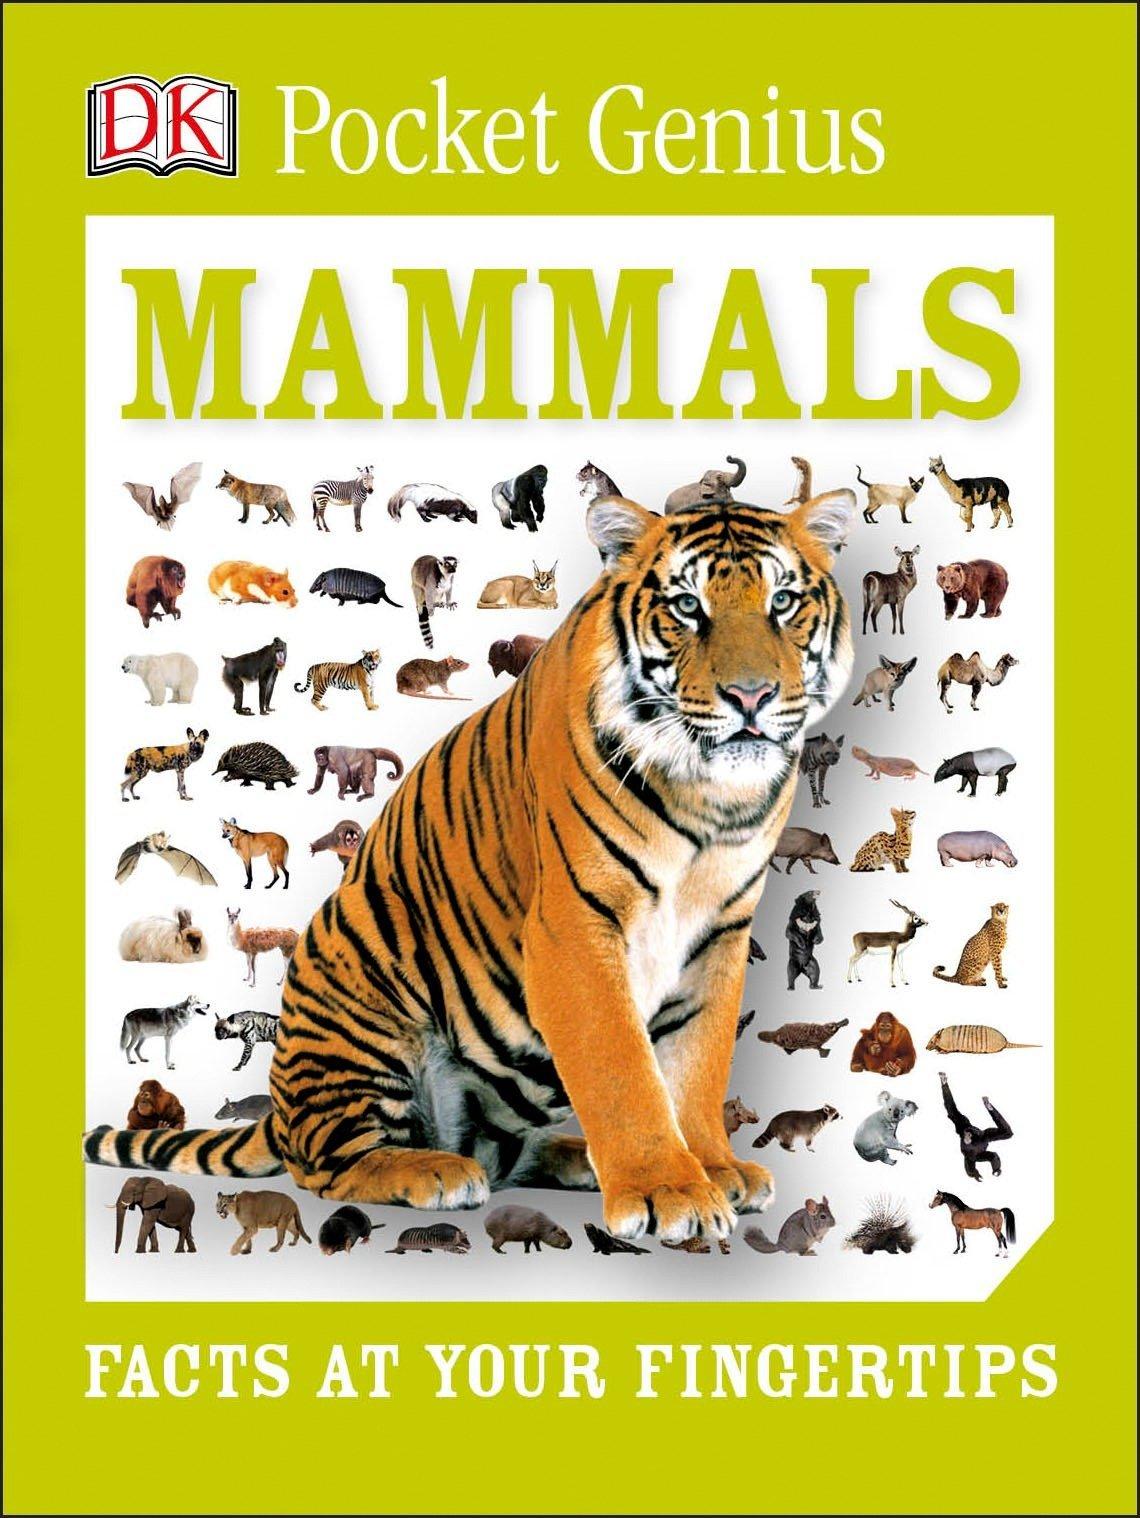 Pocket Genius: Mammals: Facts at Your Fingertips (DK Pocket Genius)